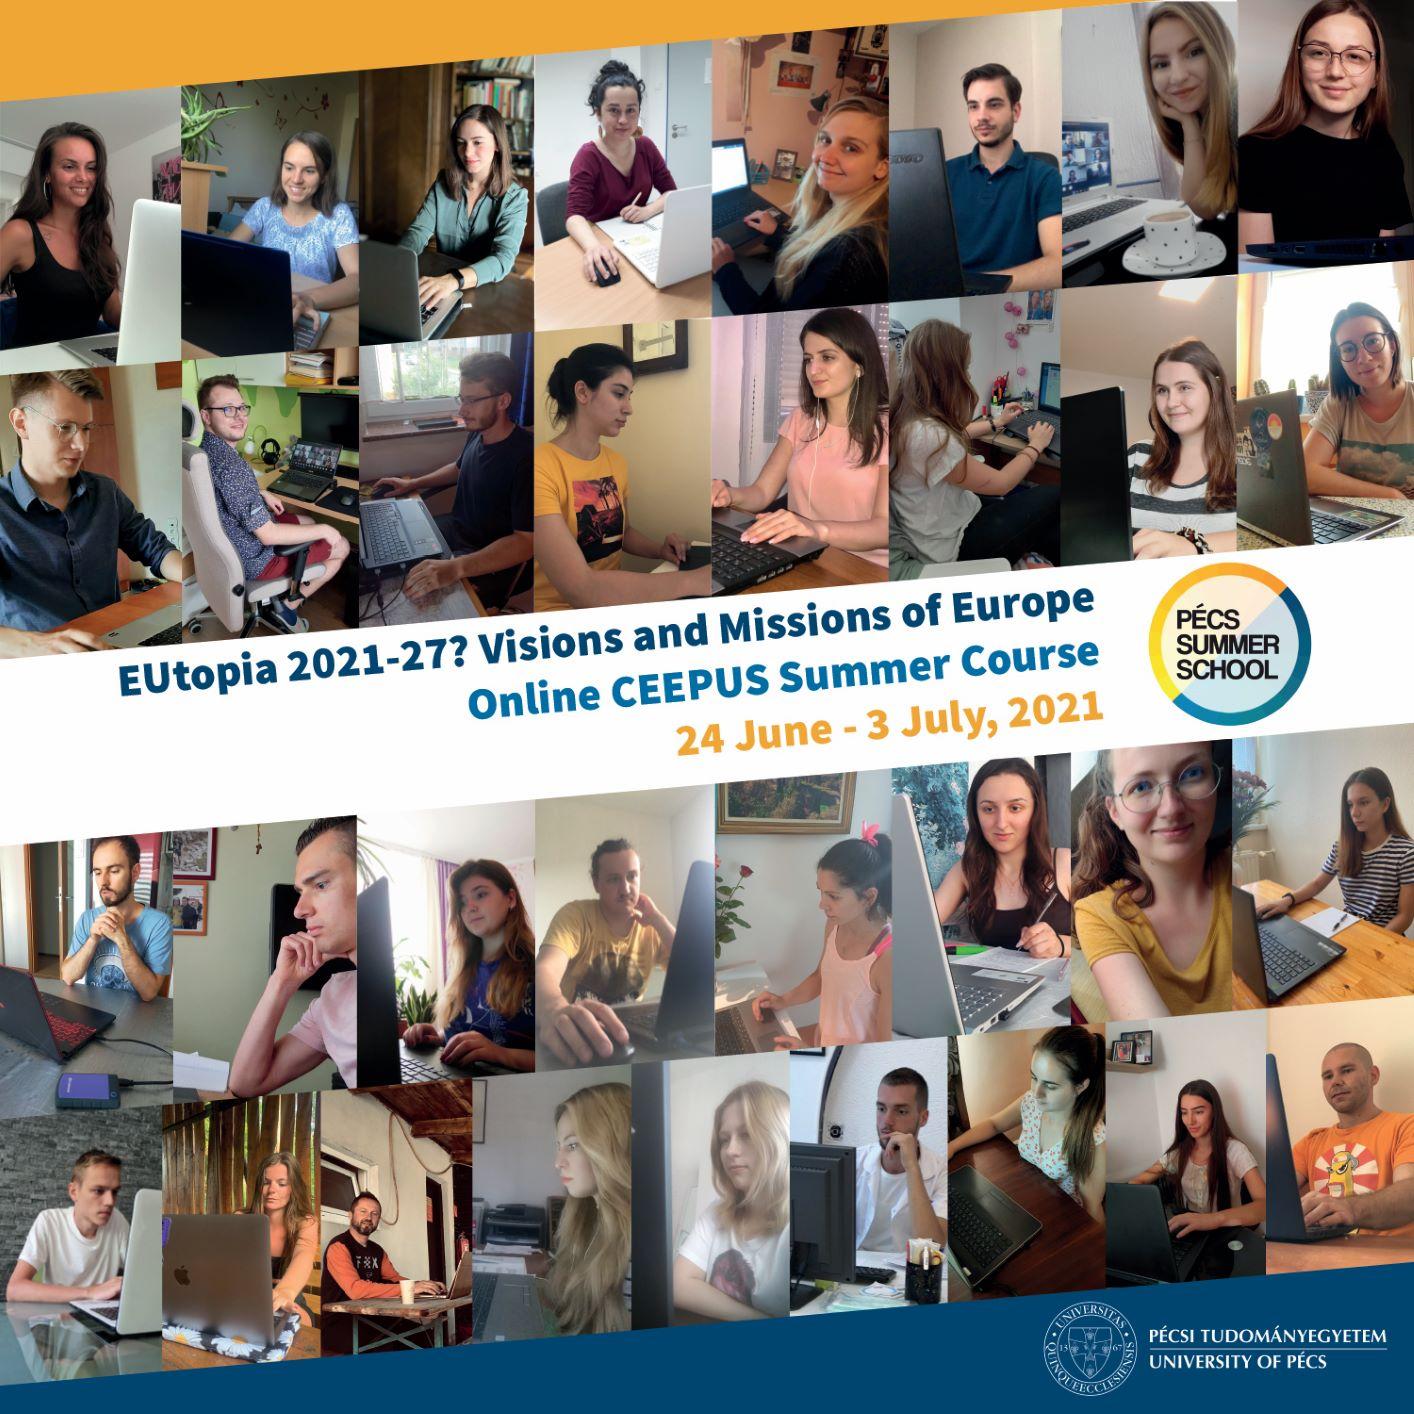 Pécs Summer School 2021